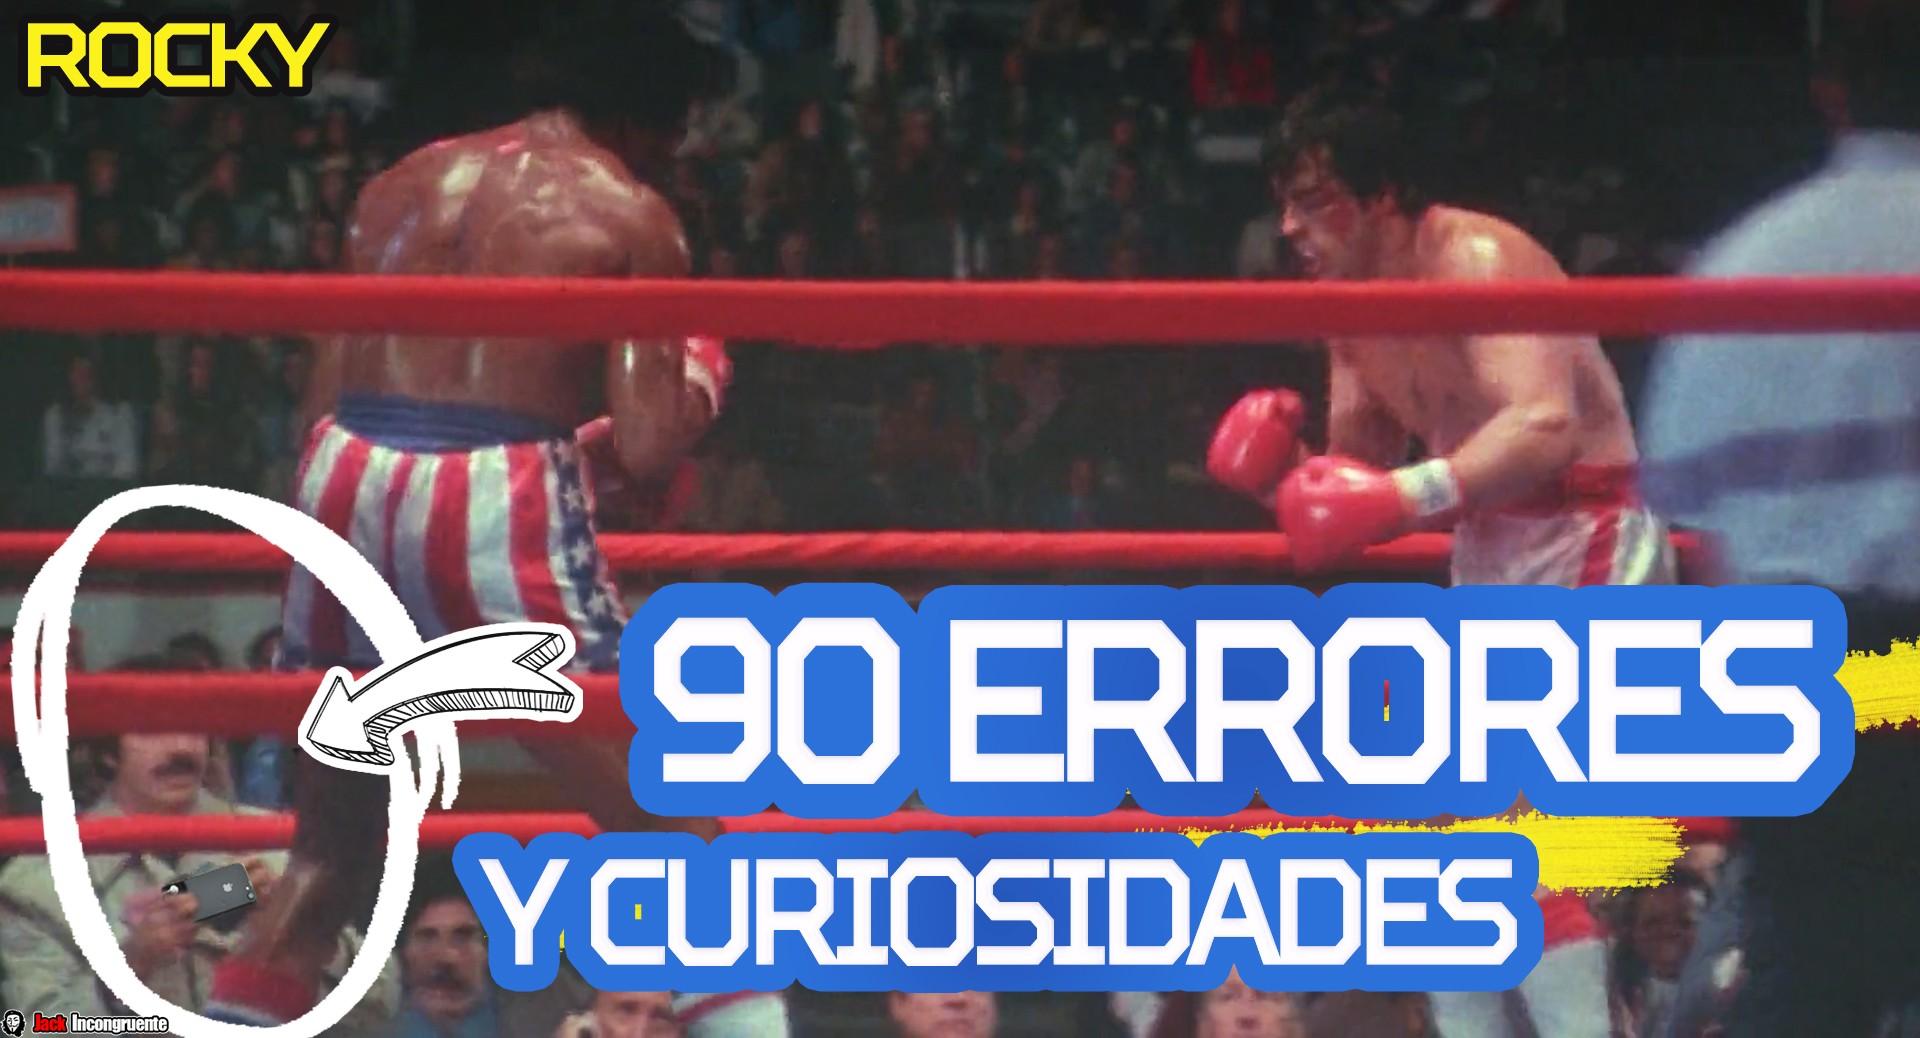 90 Errores y curiosidades de la pelicula ROCKY (pelicula de boxing silvester stallone)